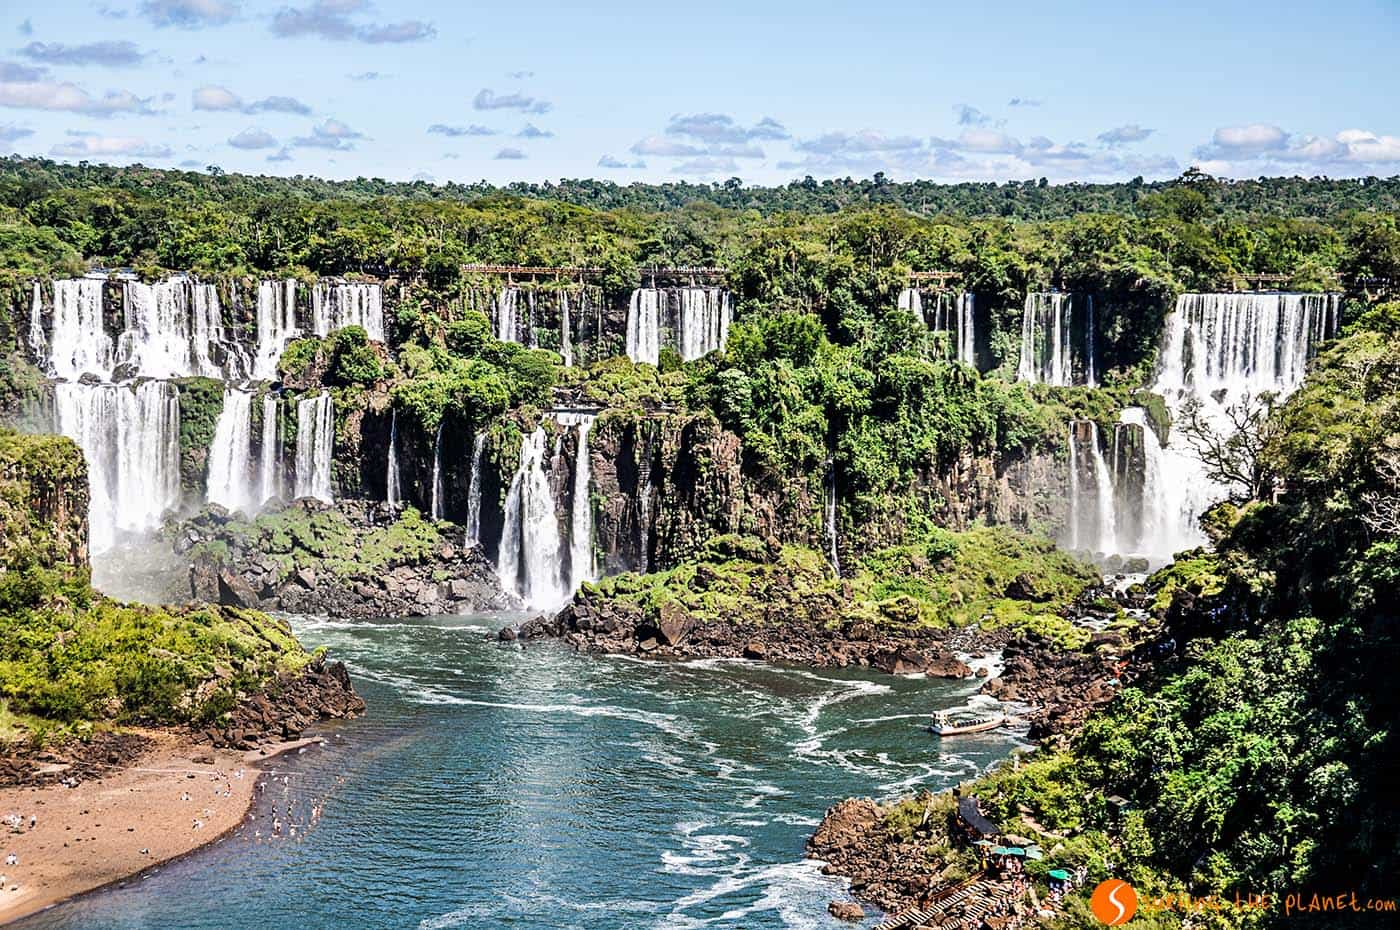 Spettacolare cascate Iguazù